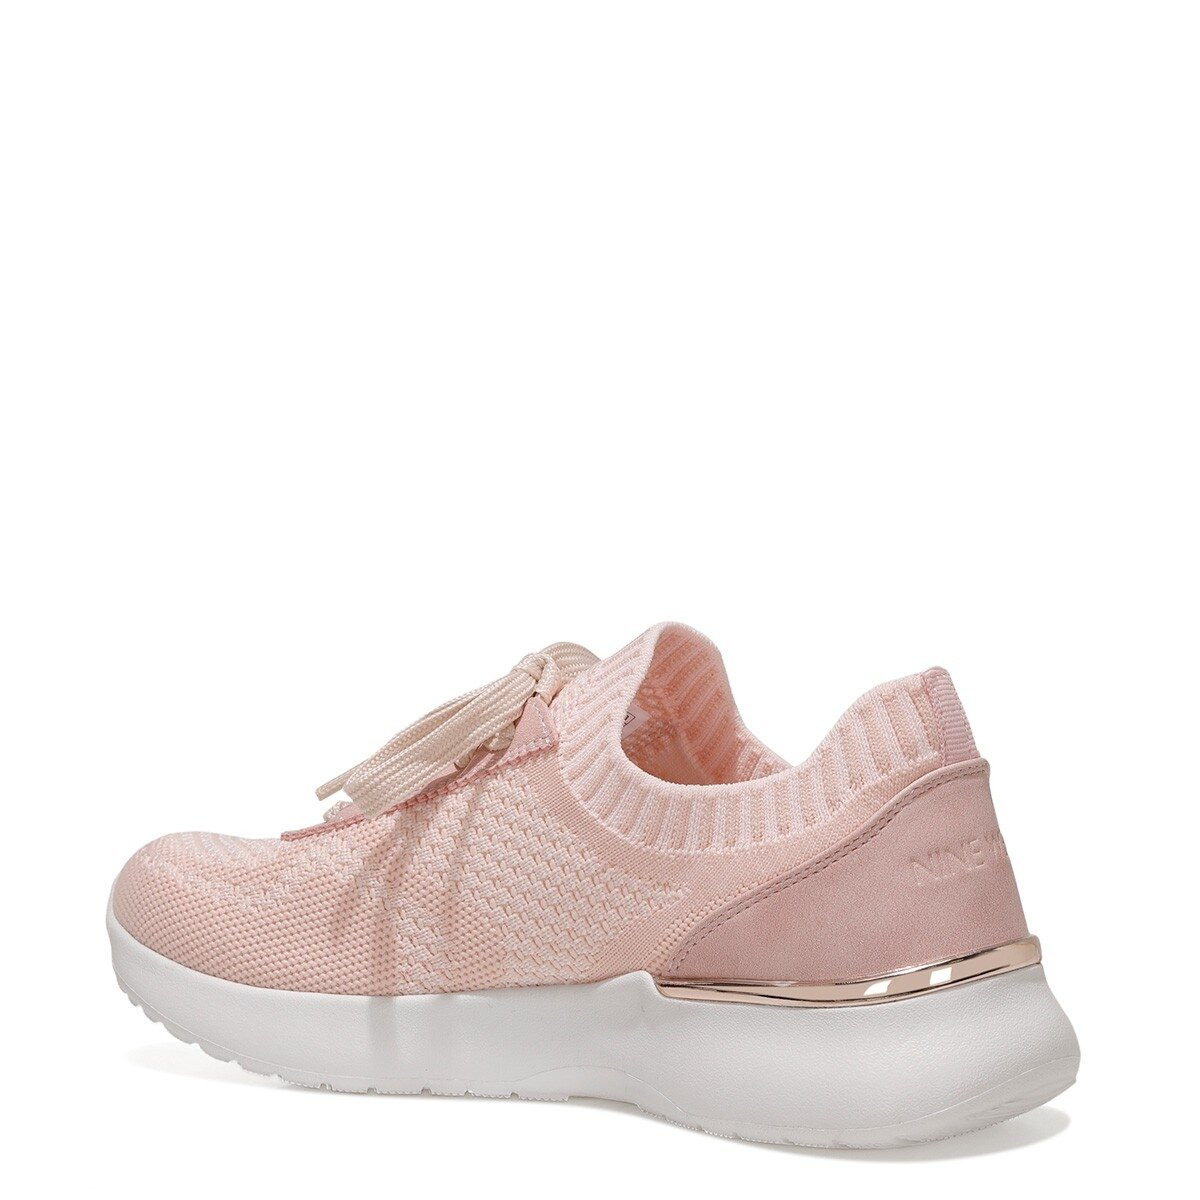 MIESSE 1FX Pembe Kadın Sneaker